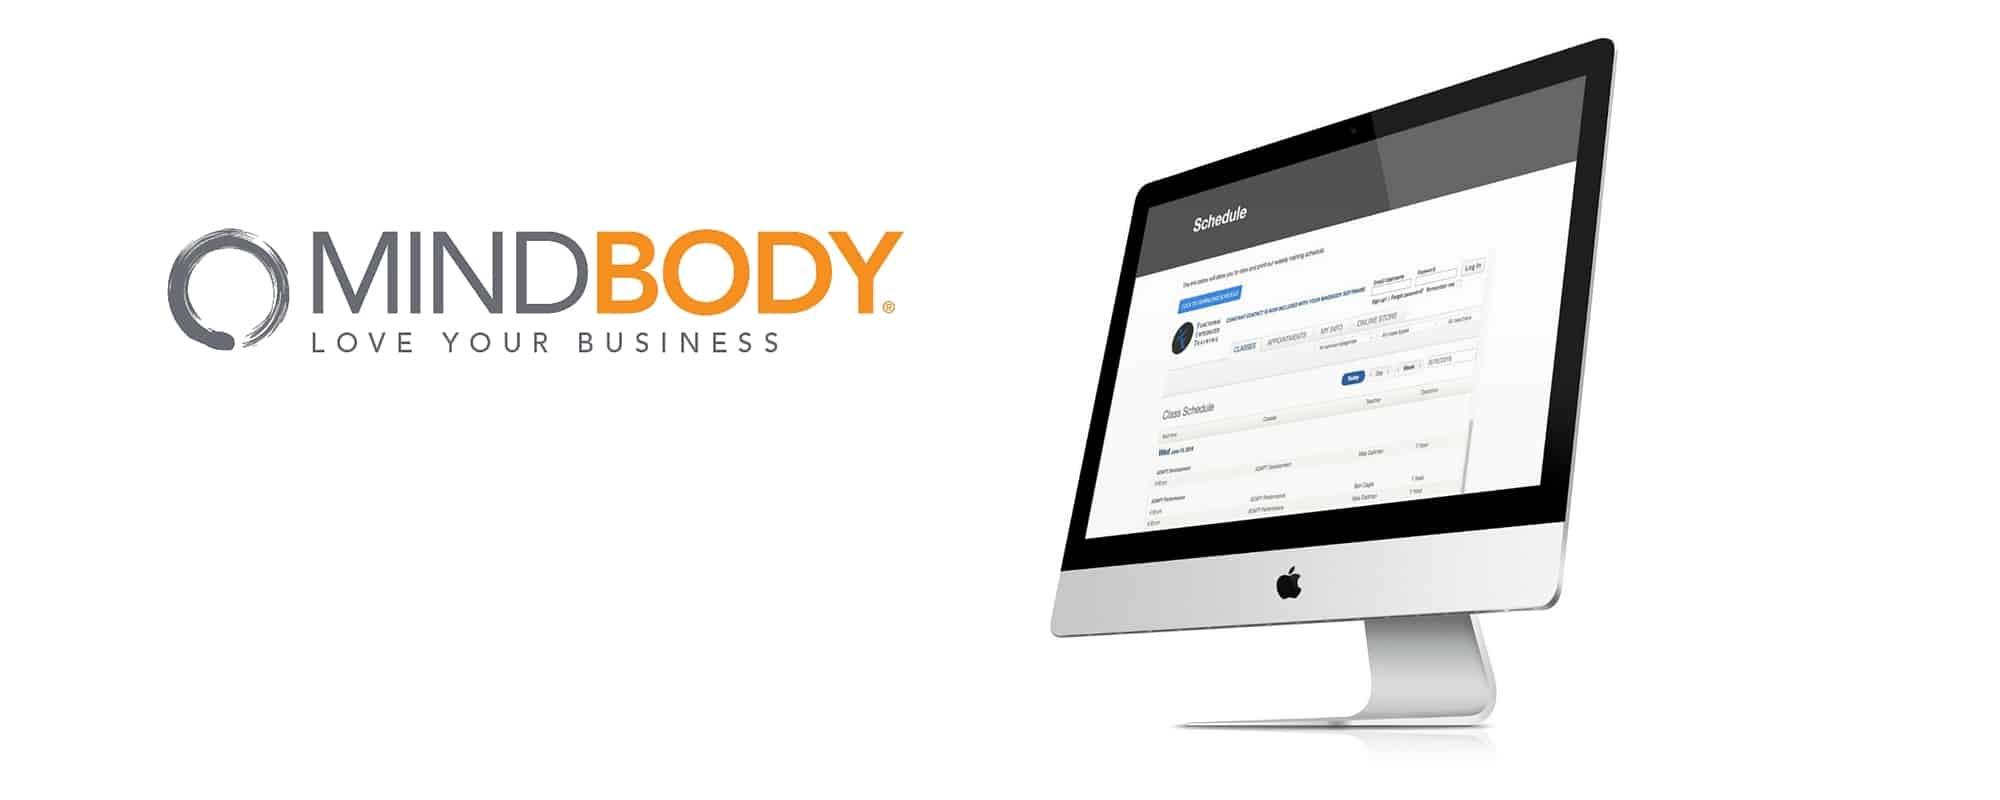 Fitness website design in Madison, WI - Enlightened Owl Digital